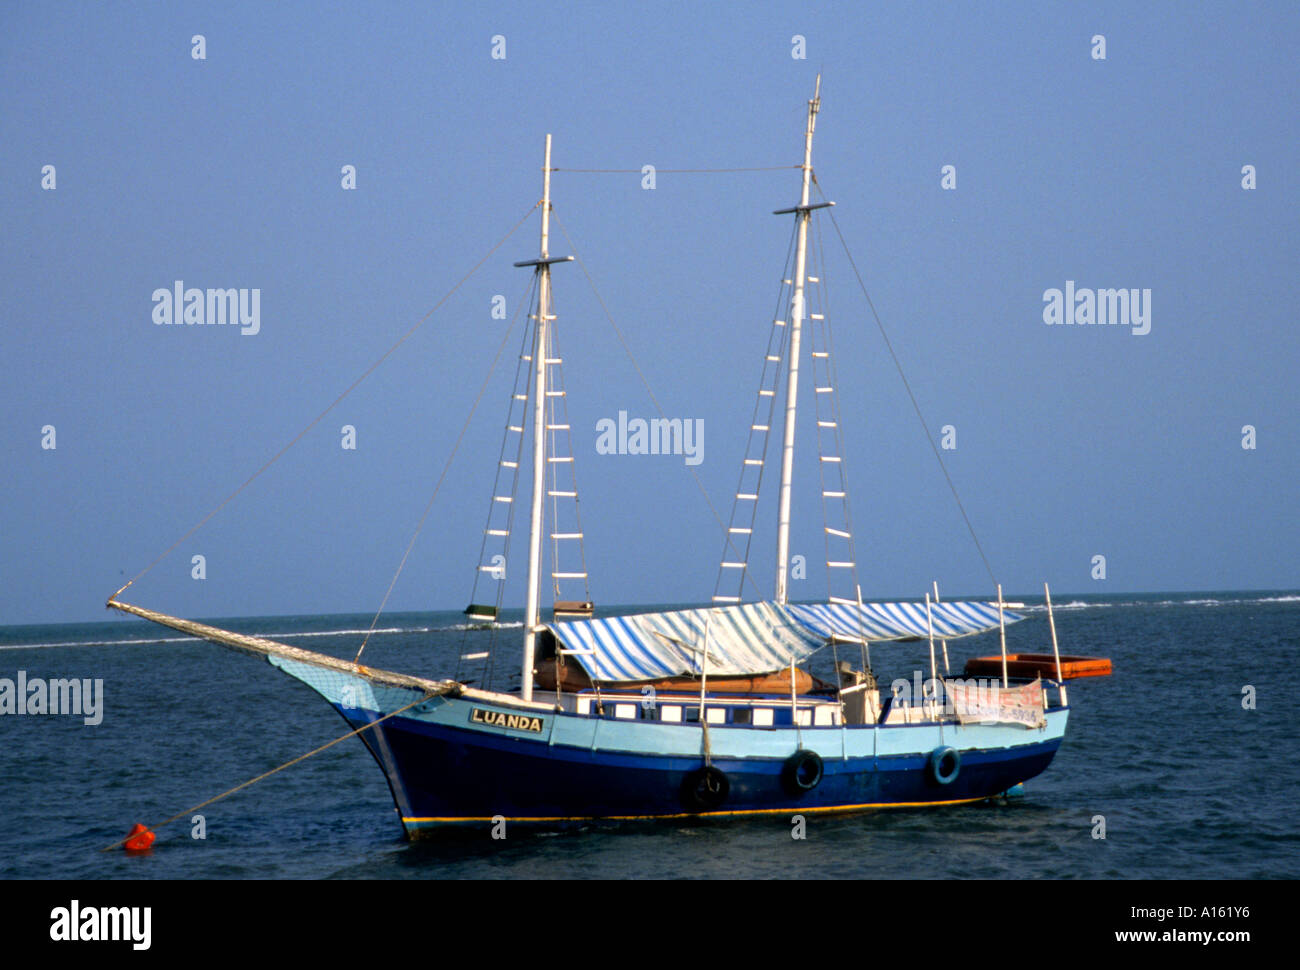 Bahia Brazil l Brazilian boat sailing fishing sea - Stock Image